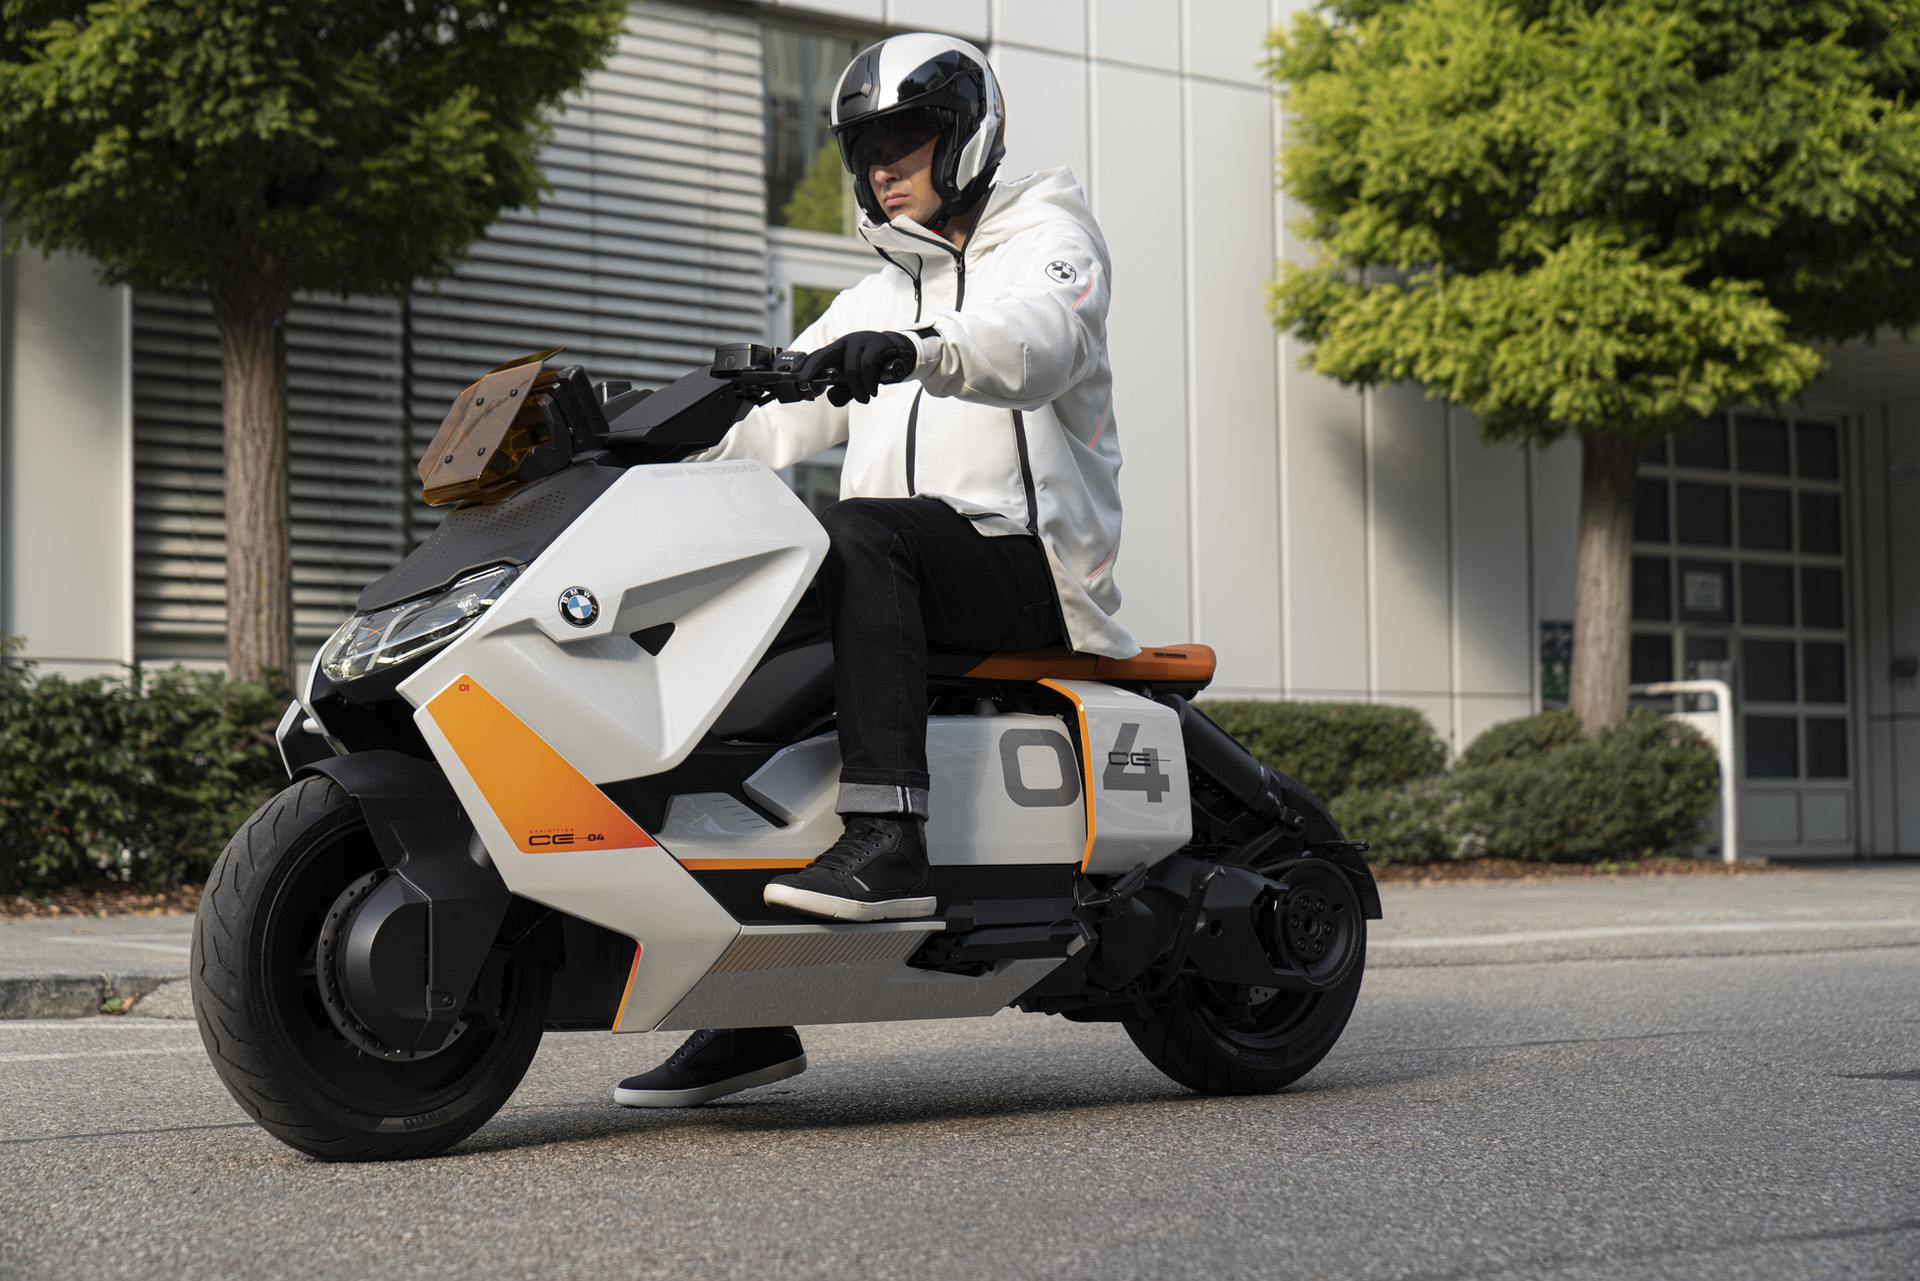 BMW Motorrad Definition CE 04 33